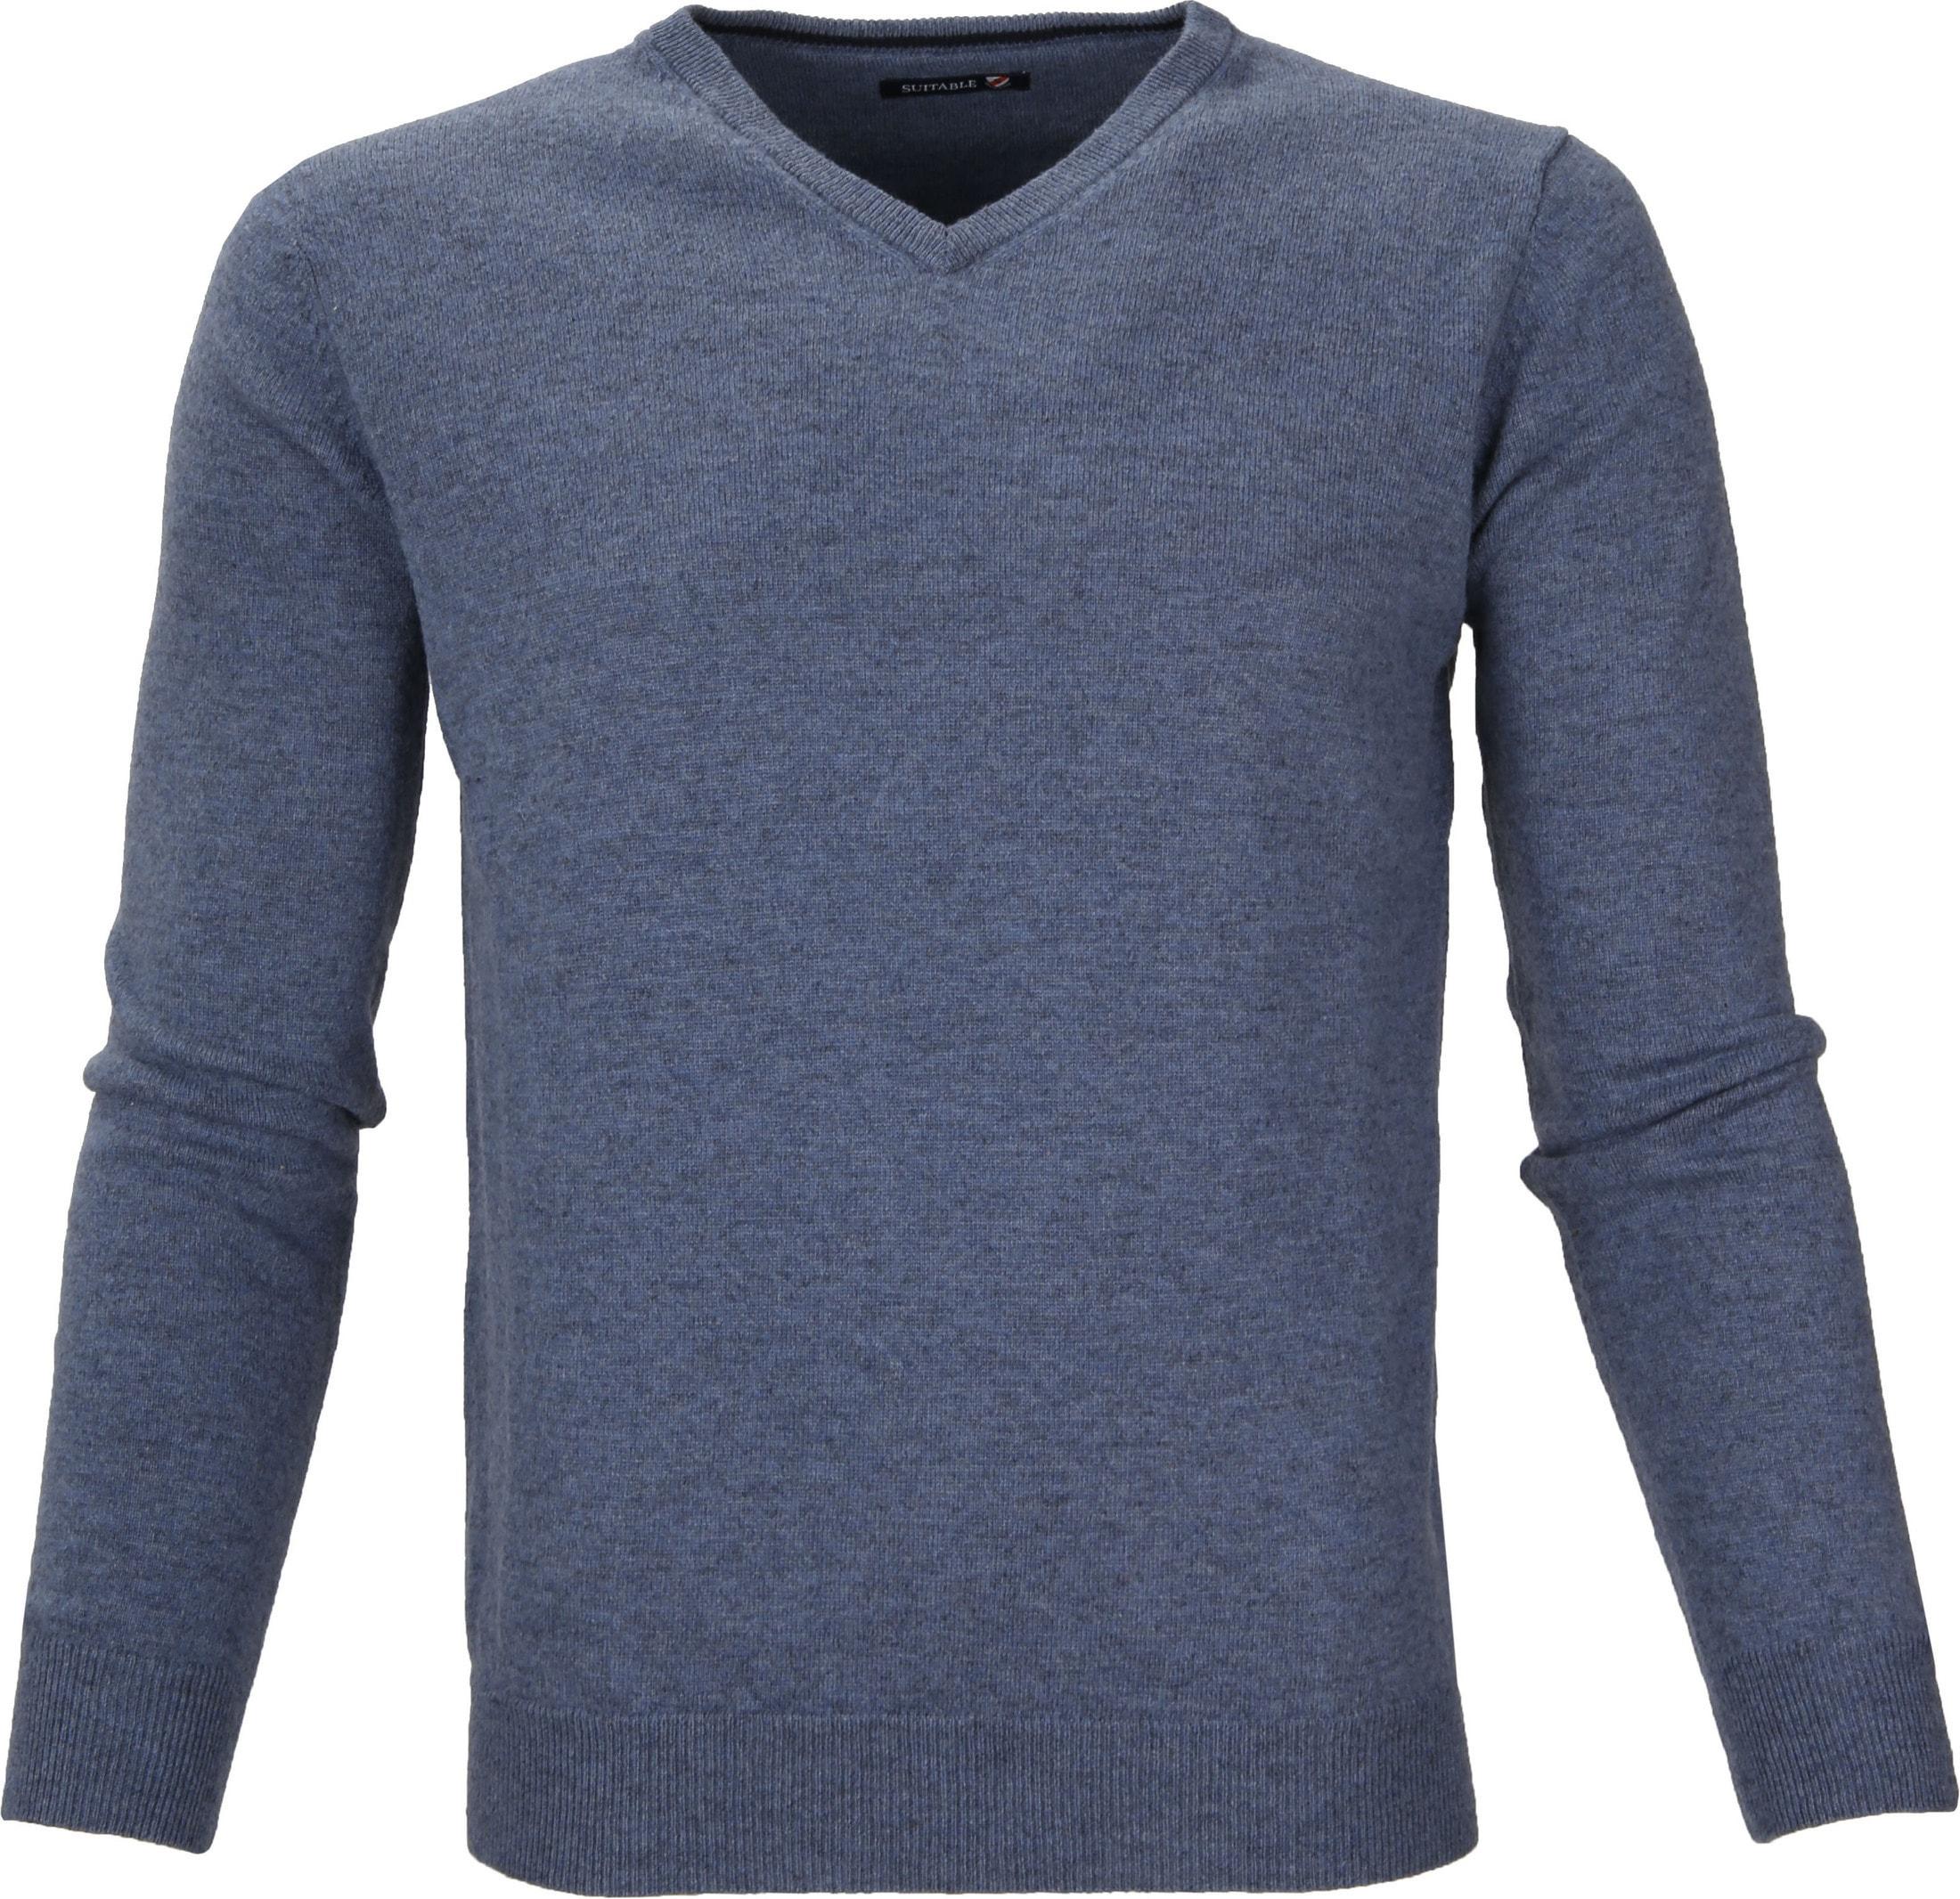 Suitable Pullover Lammwolle V-Ausschnitt Hellblau foto 0